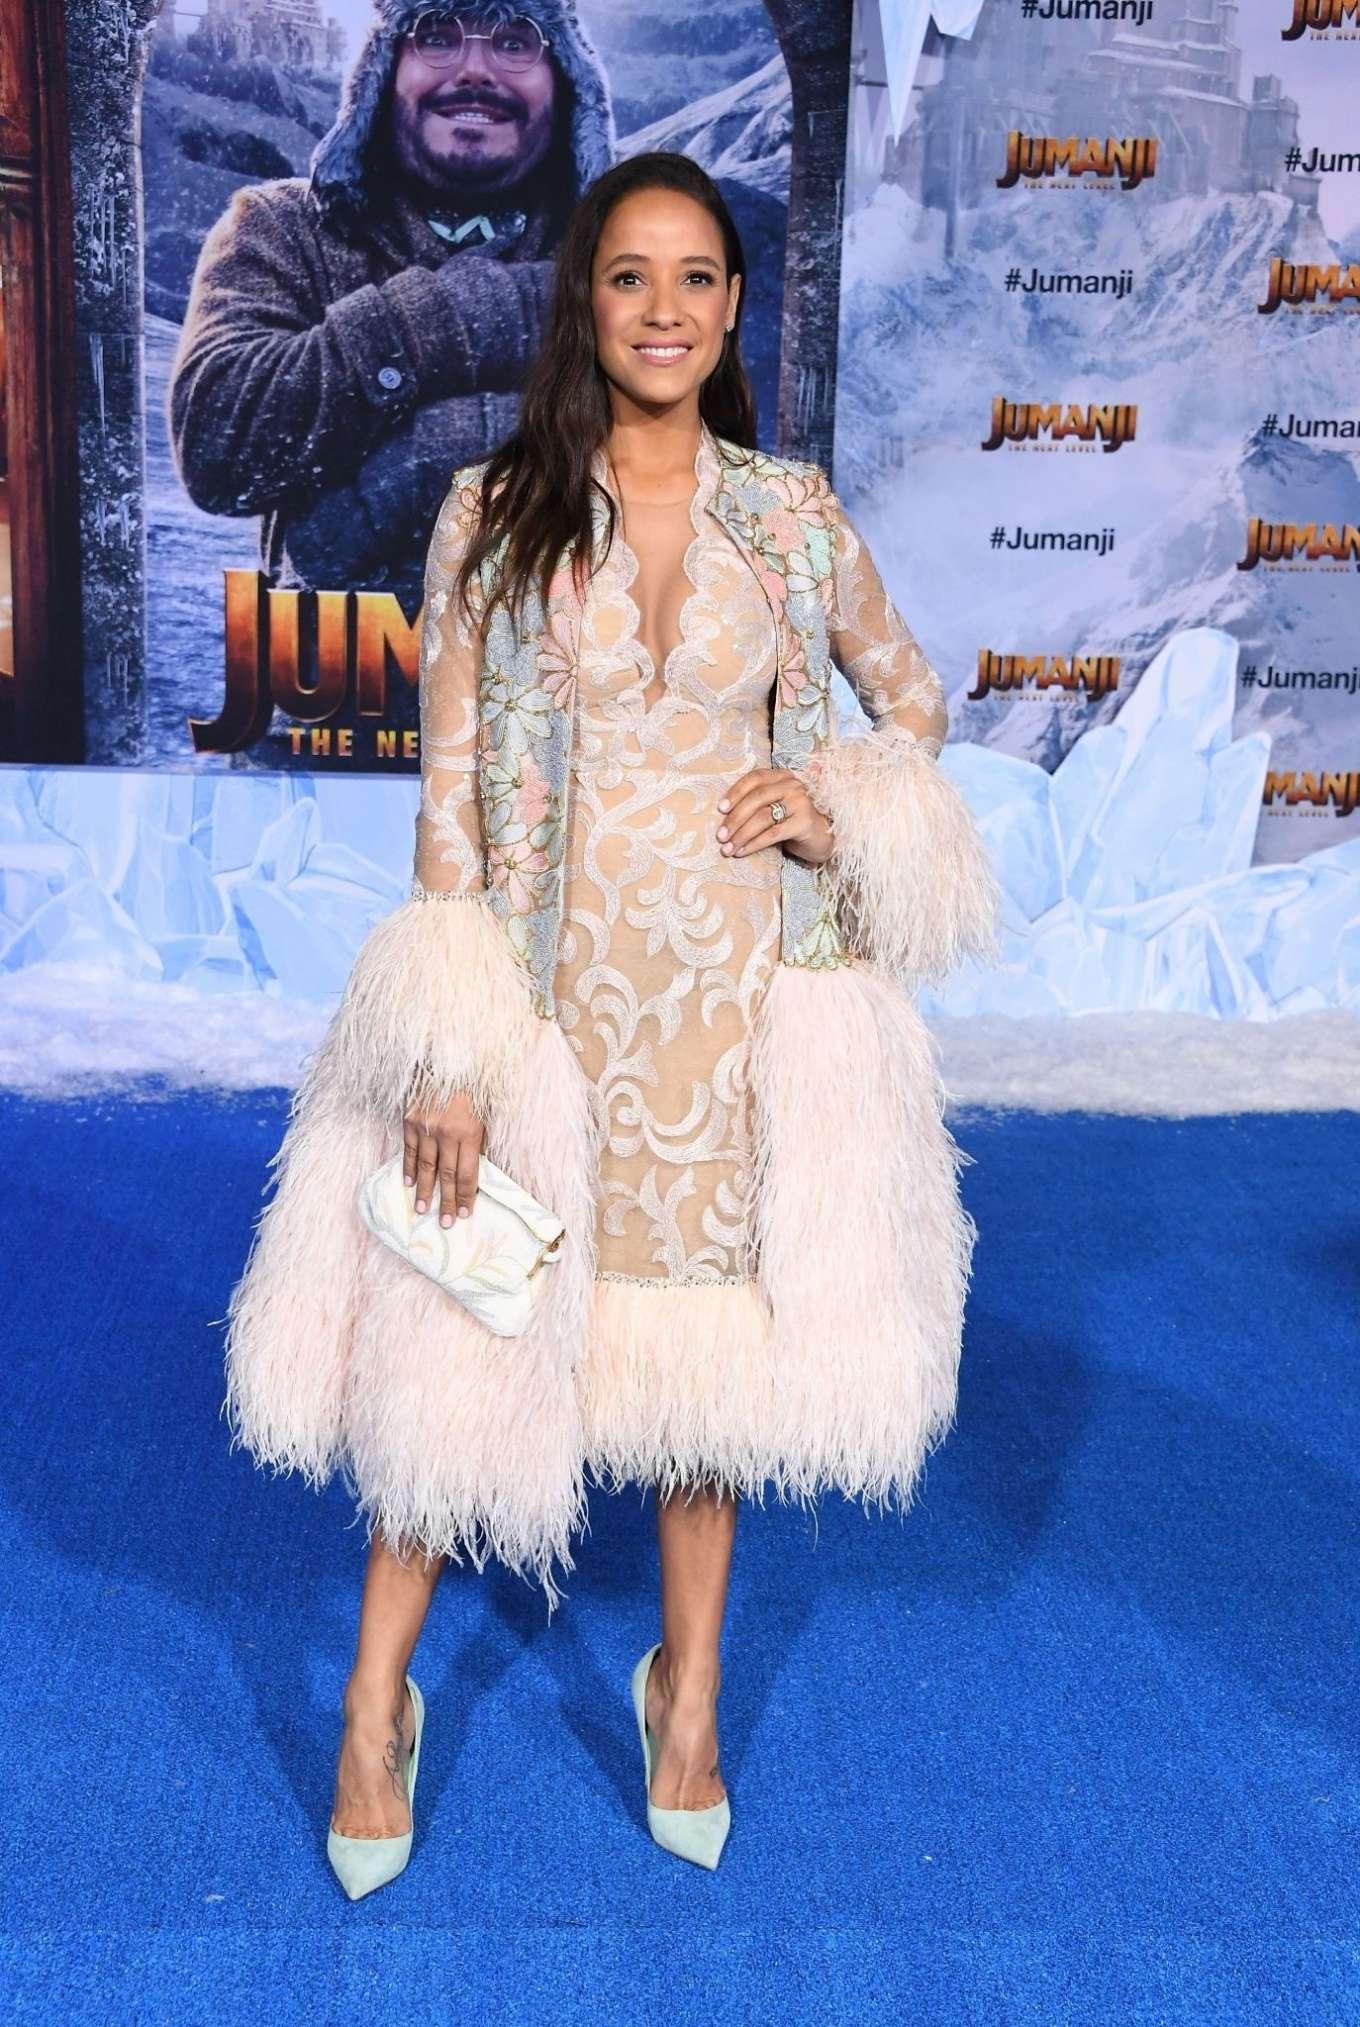 Dania Ramirez 2019 : Dania Ramirez – Jumanji: The Next Level premiere in Hollywood-06